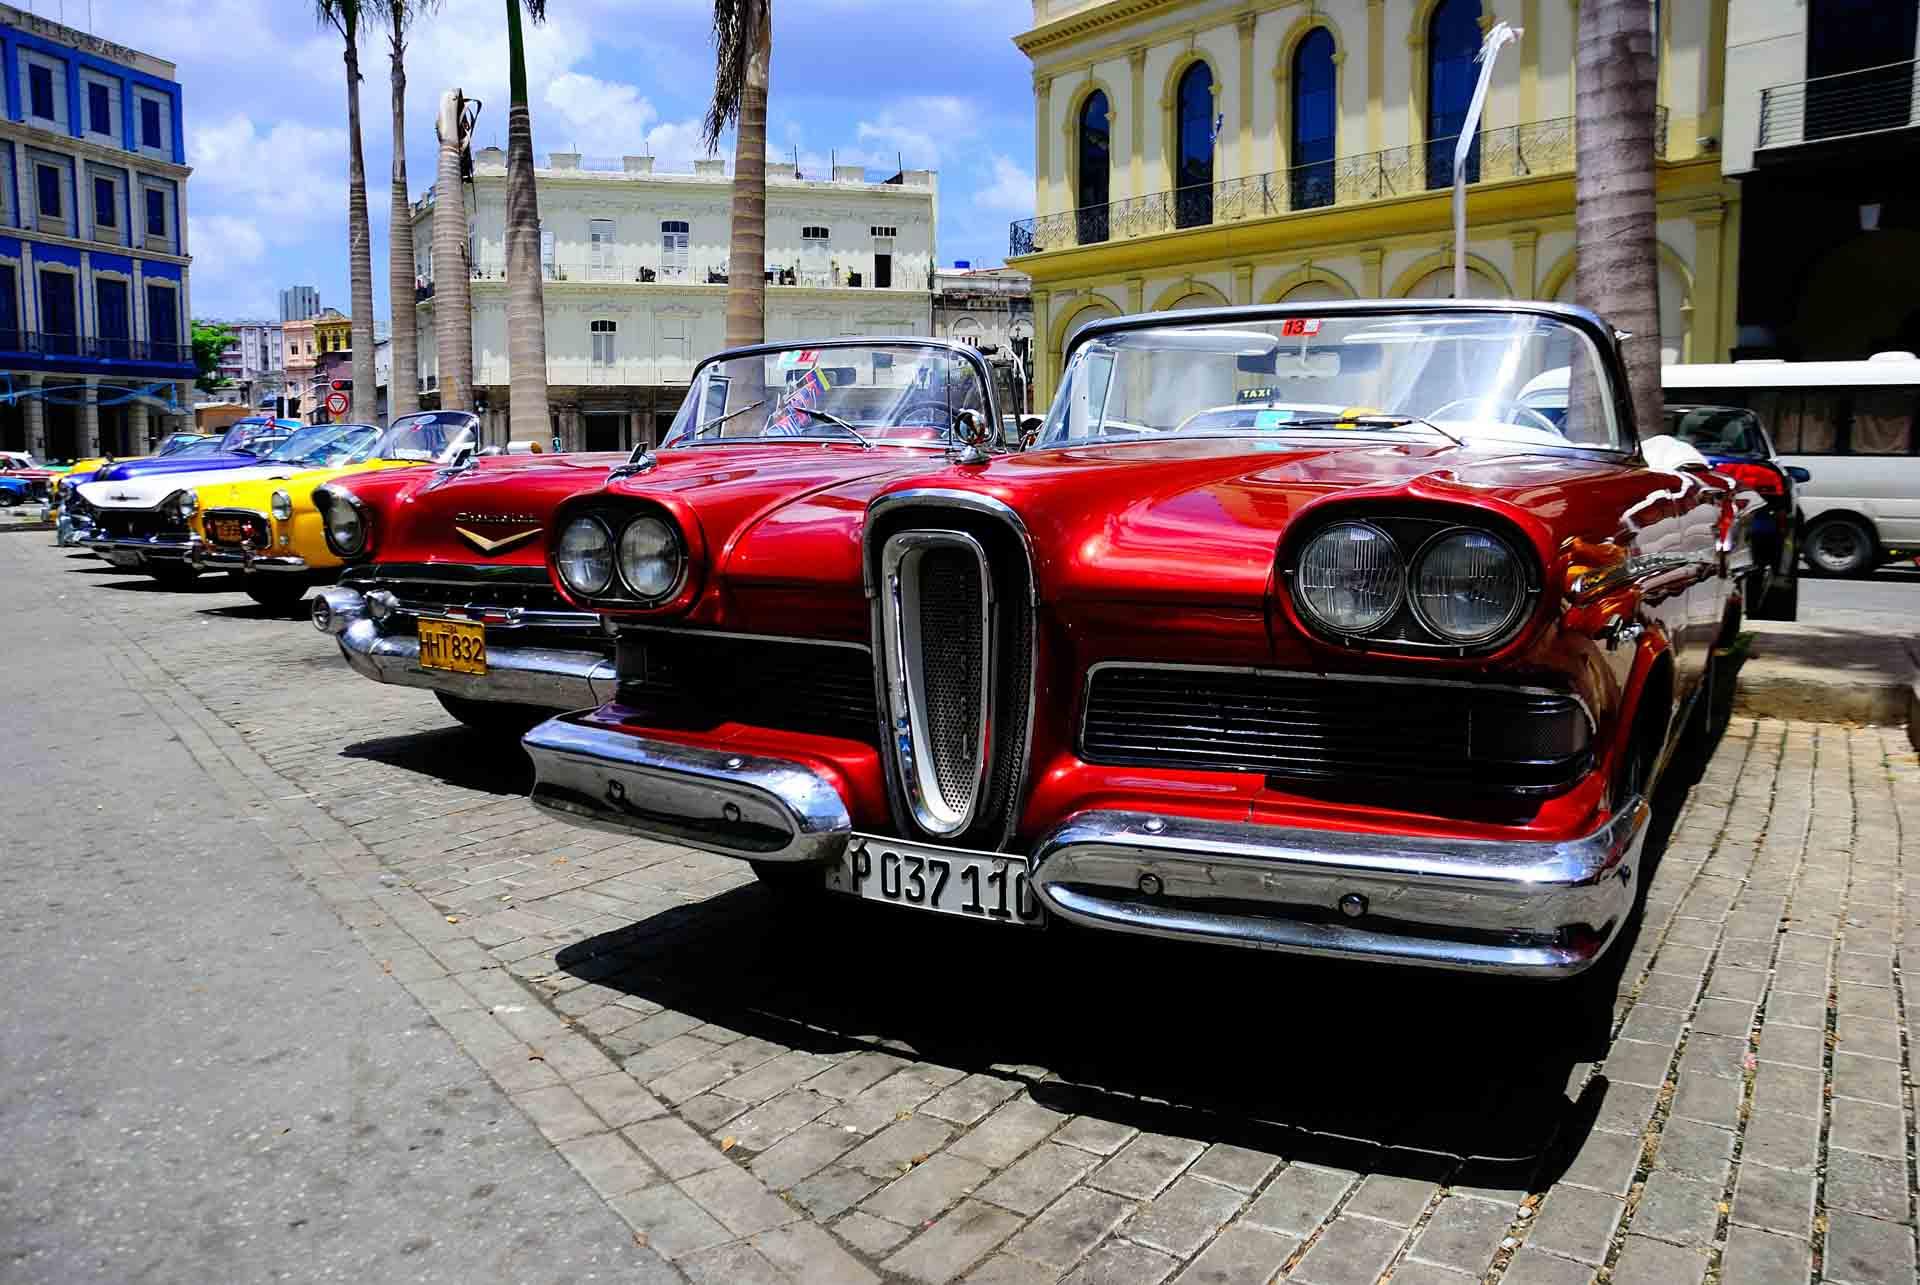 Havana Cuba Vintage Car 1 - PescArt